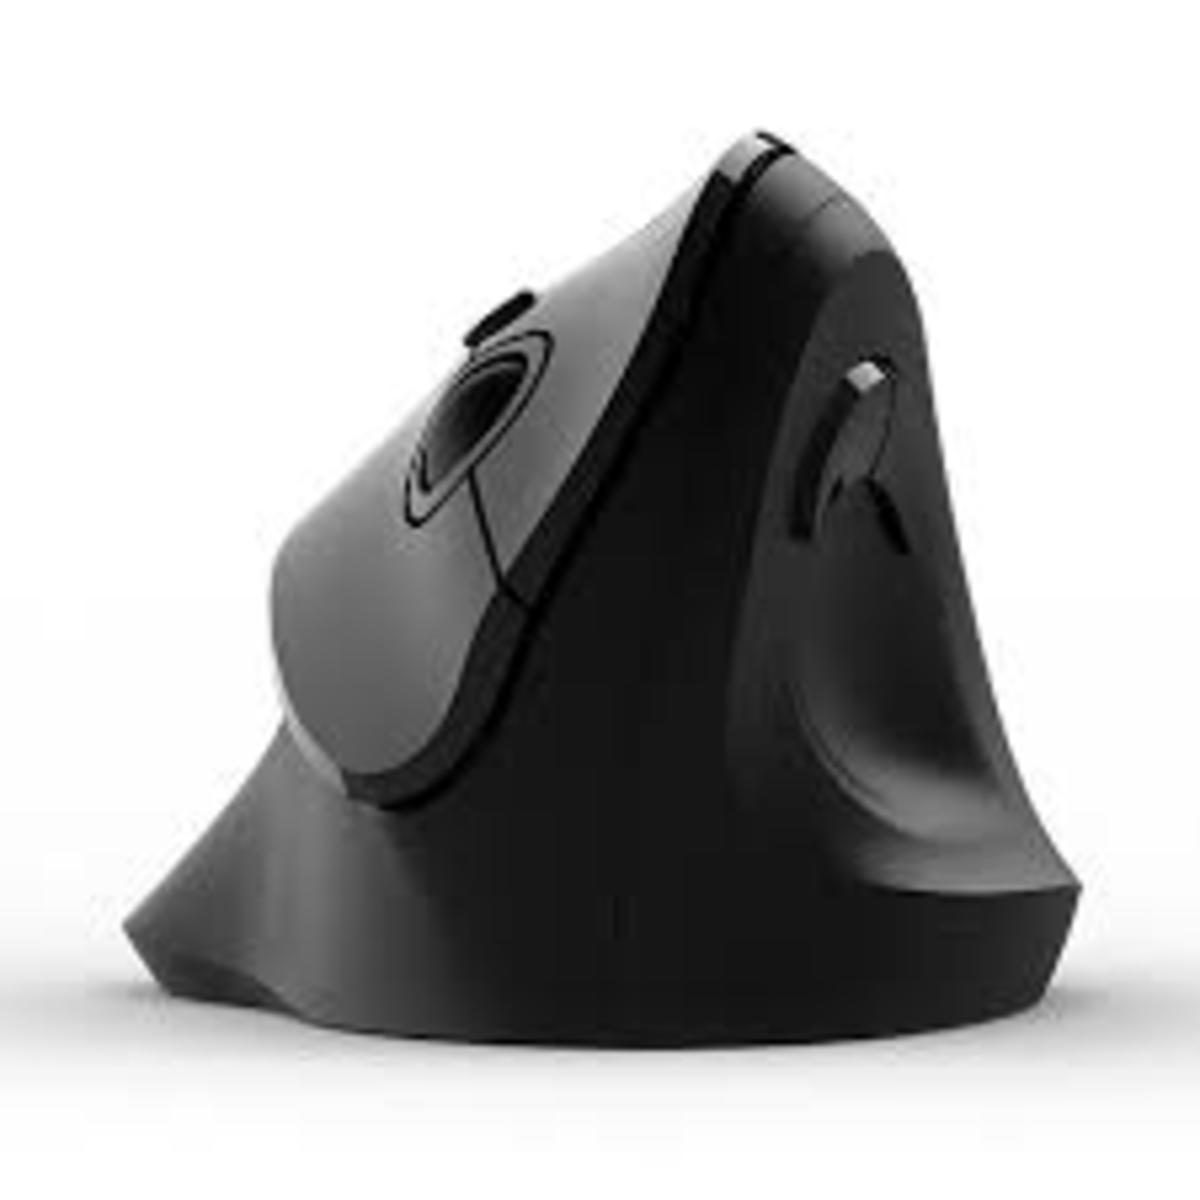 i887 2.4G Wireless Mouse (Black)